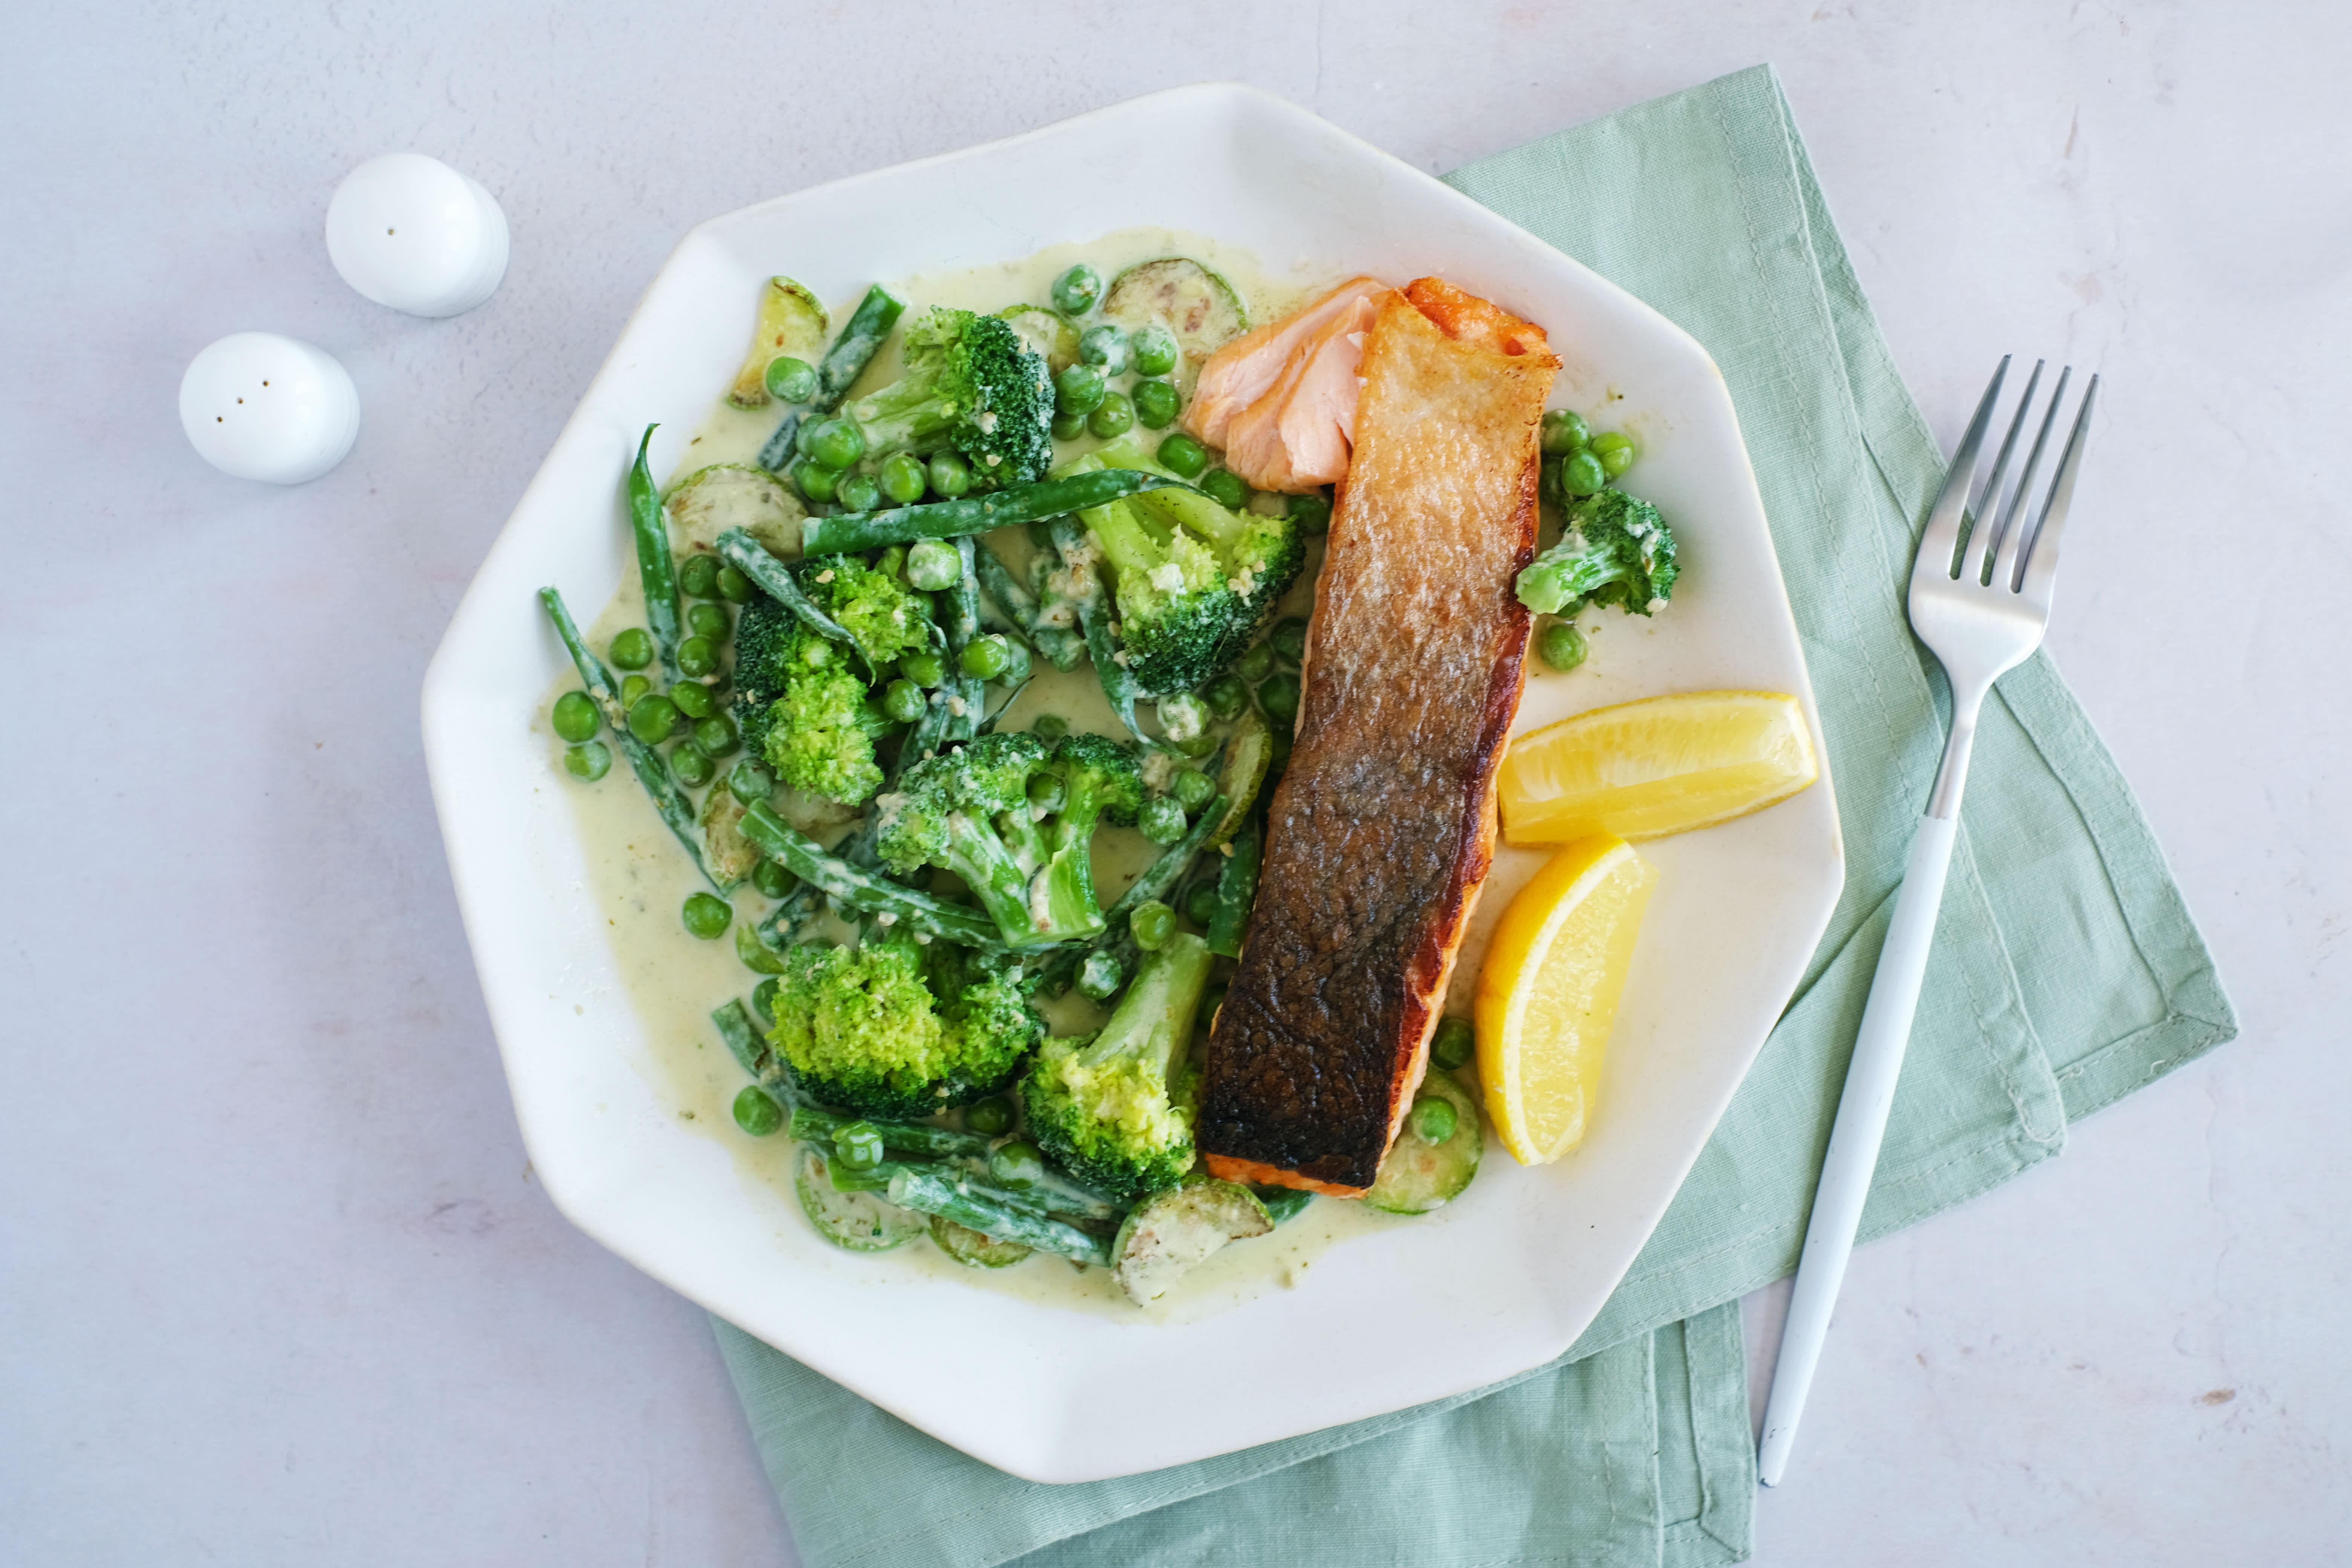 Pan-fried Salmon with Creamy Pesto Vegetables